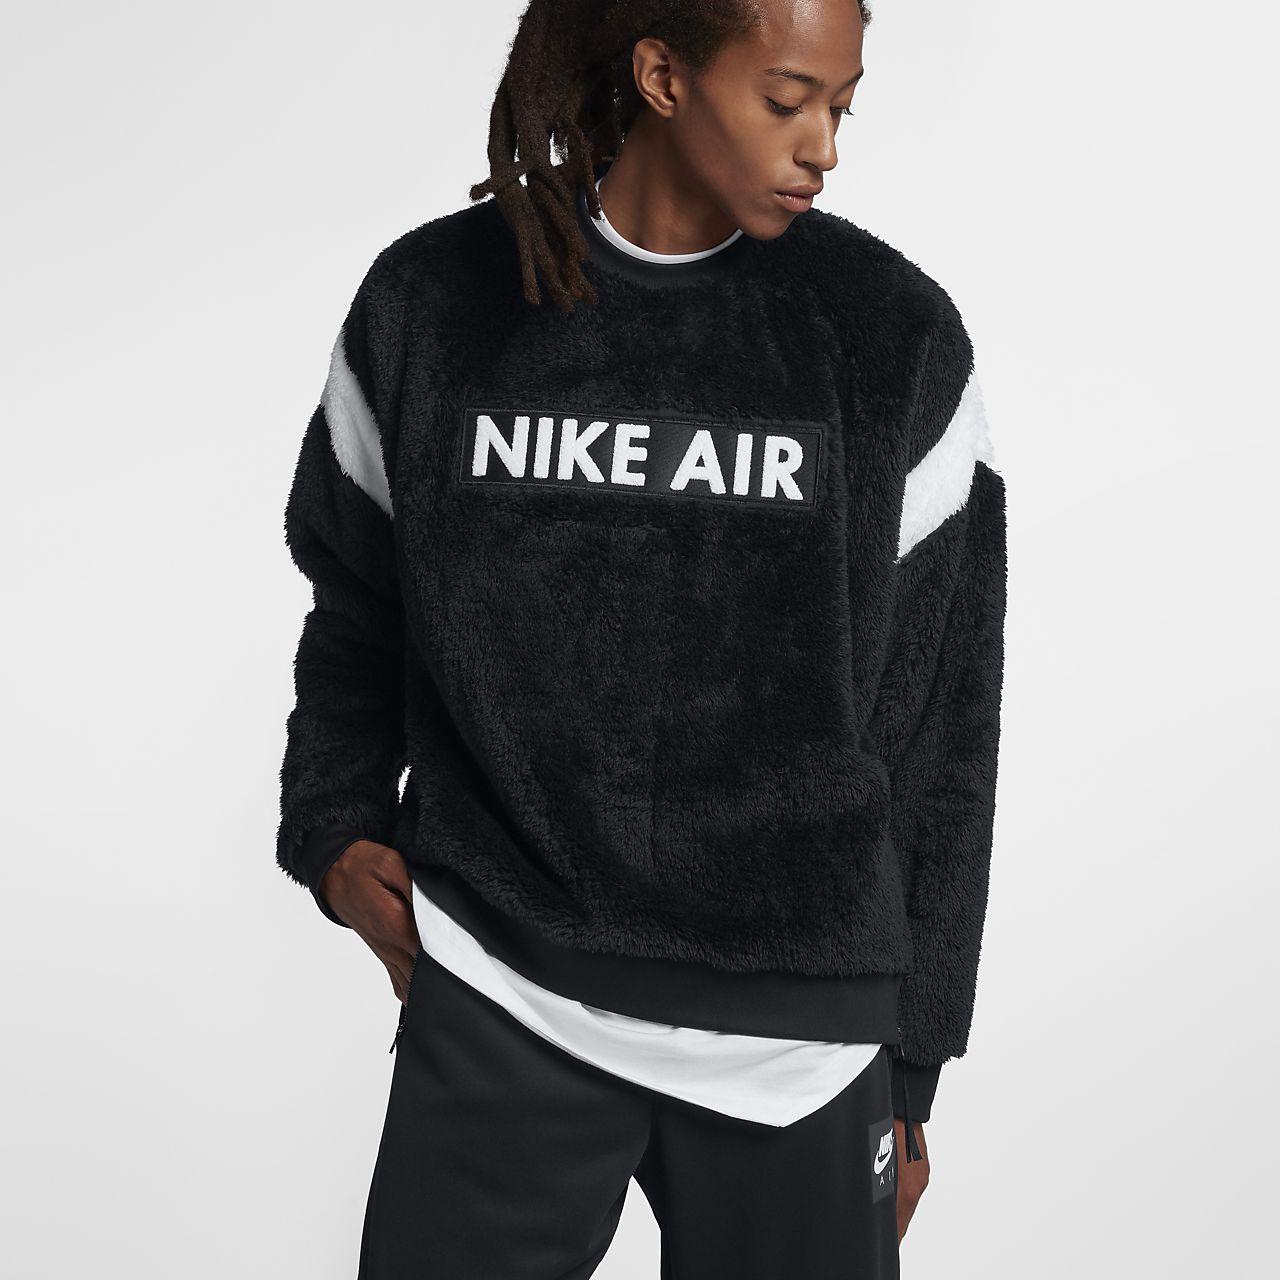 Nike Air Men s Long Sleeve Crew. Nike.com 1af8c12b7